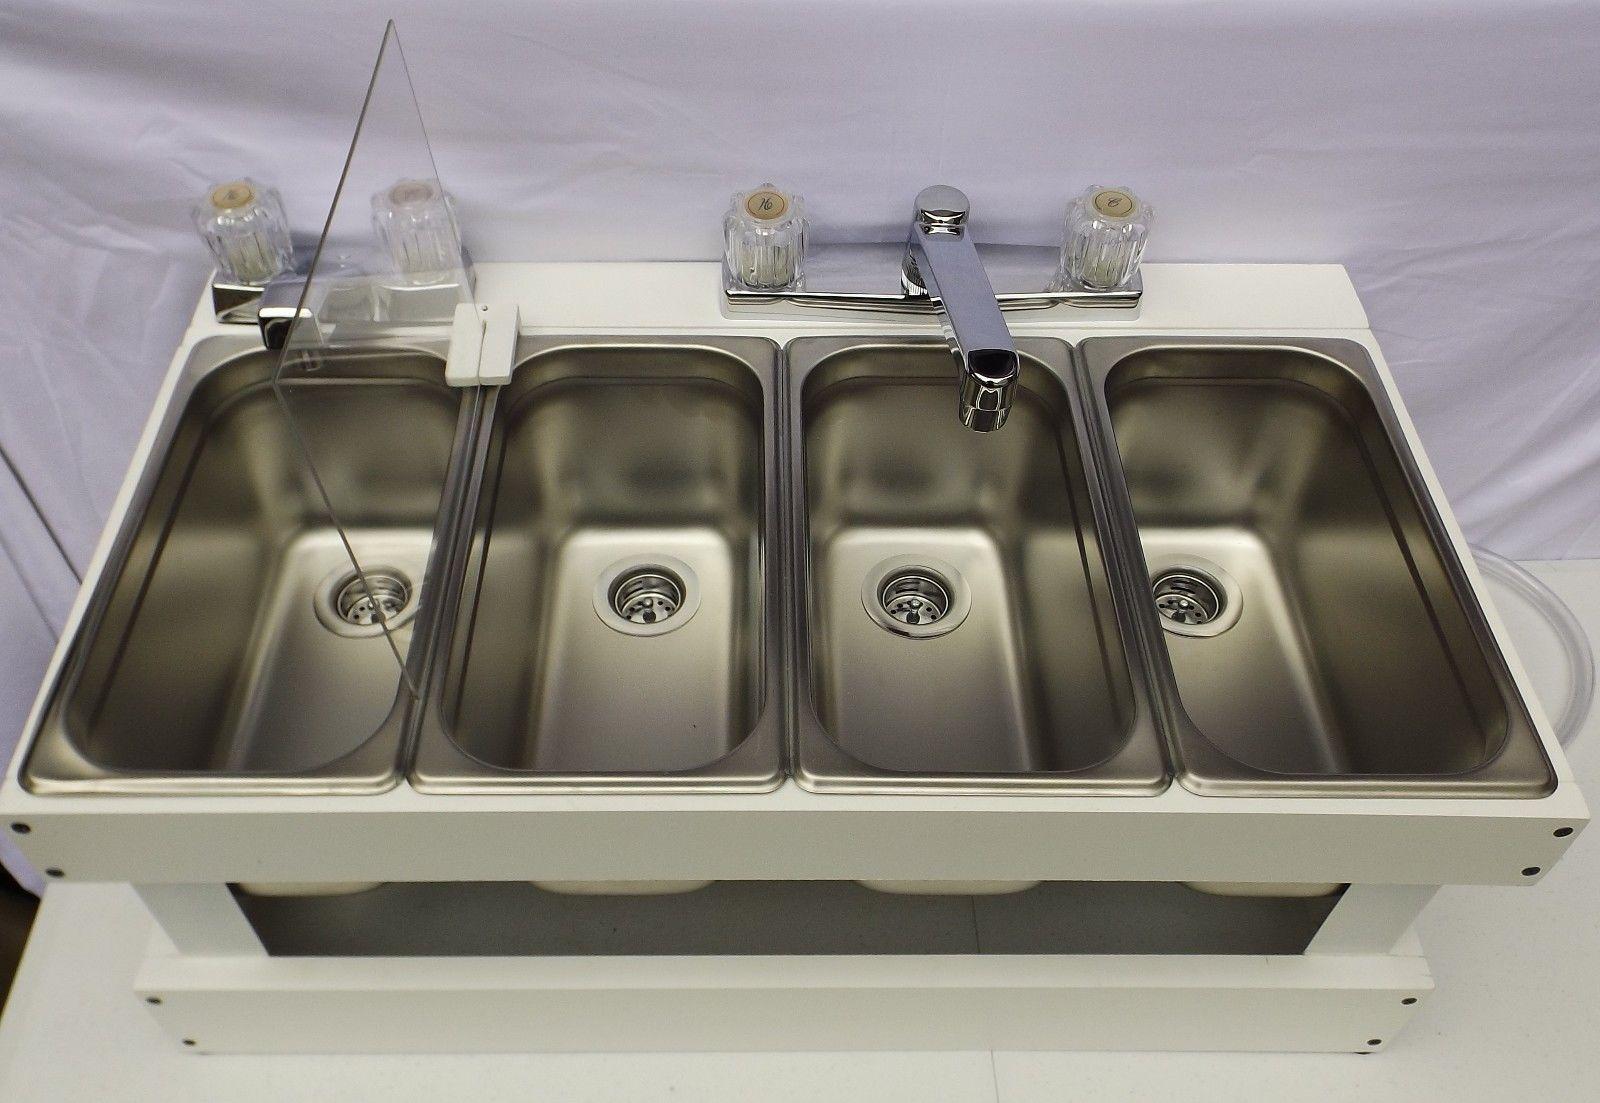 Portable Sink Mobile Concession 3 Compartment With Hand Wash Sink Smw Portable Sink Sink Hand Washing